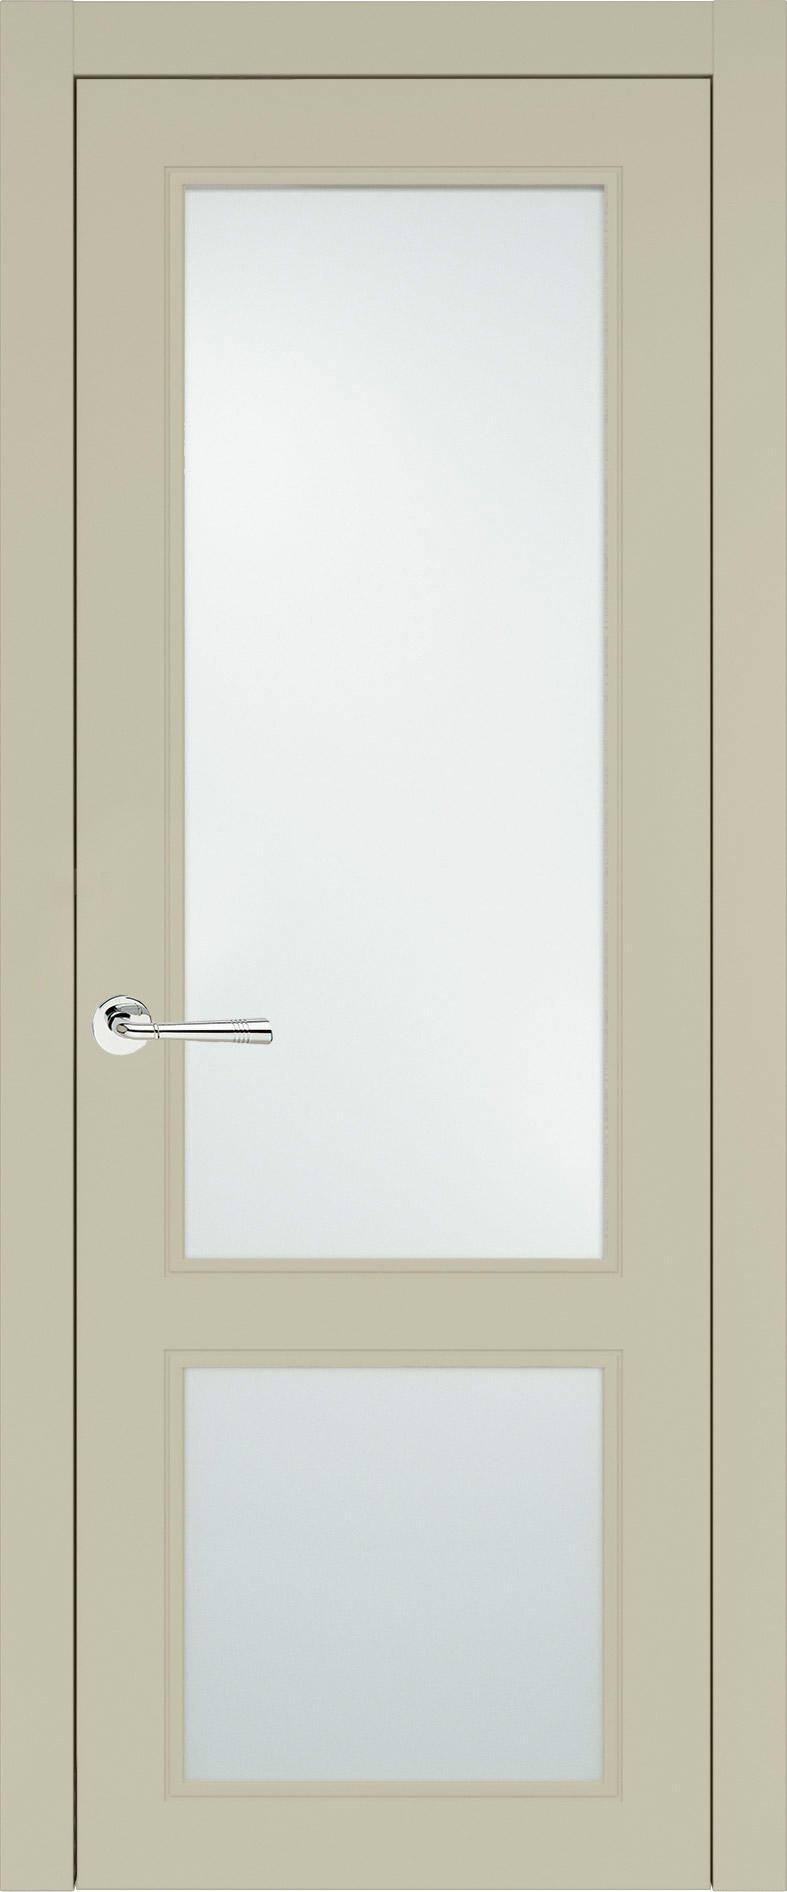 Dinastia Neo Classic цвет - Серо-оливковая эмаль (RAL 7032) Со стеклом (ДО)